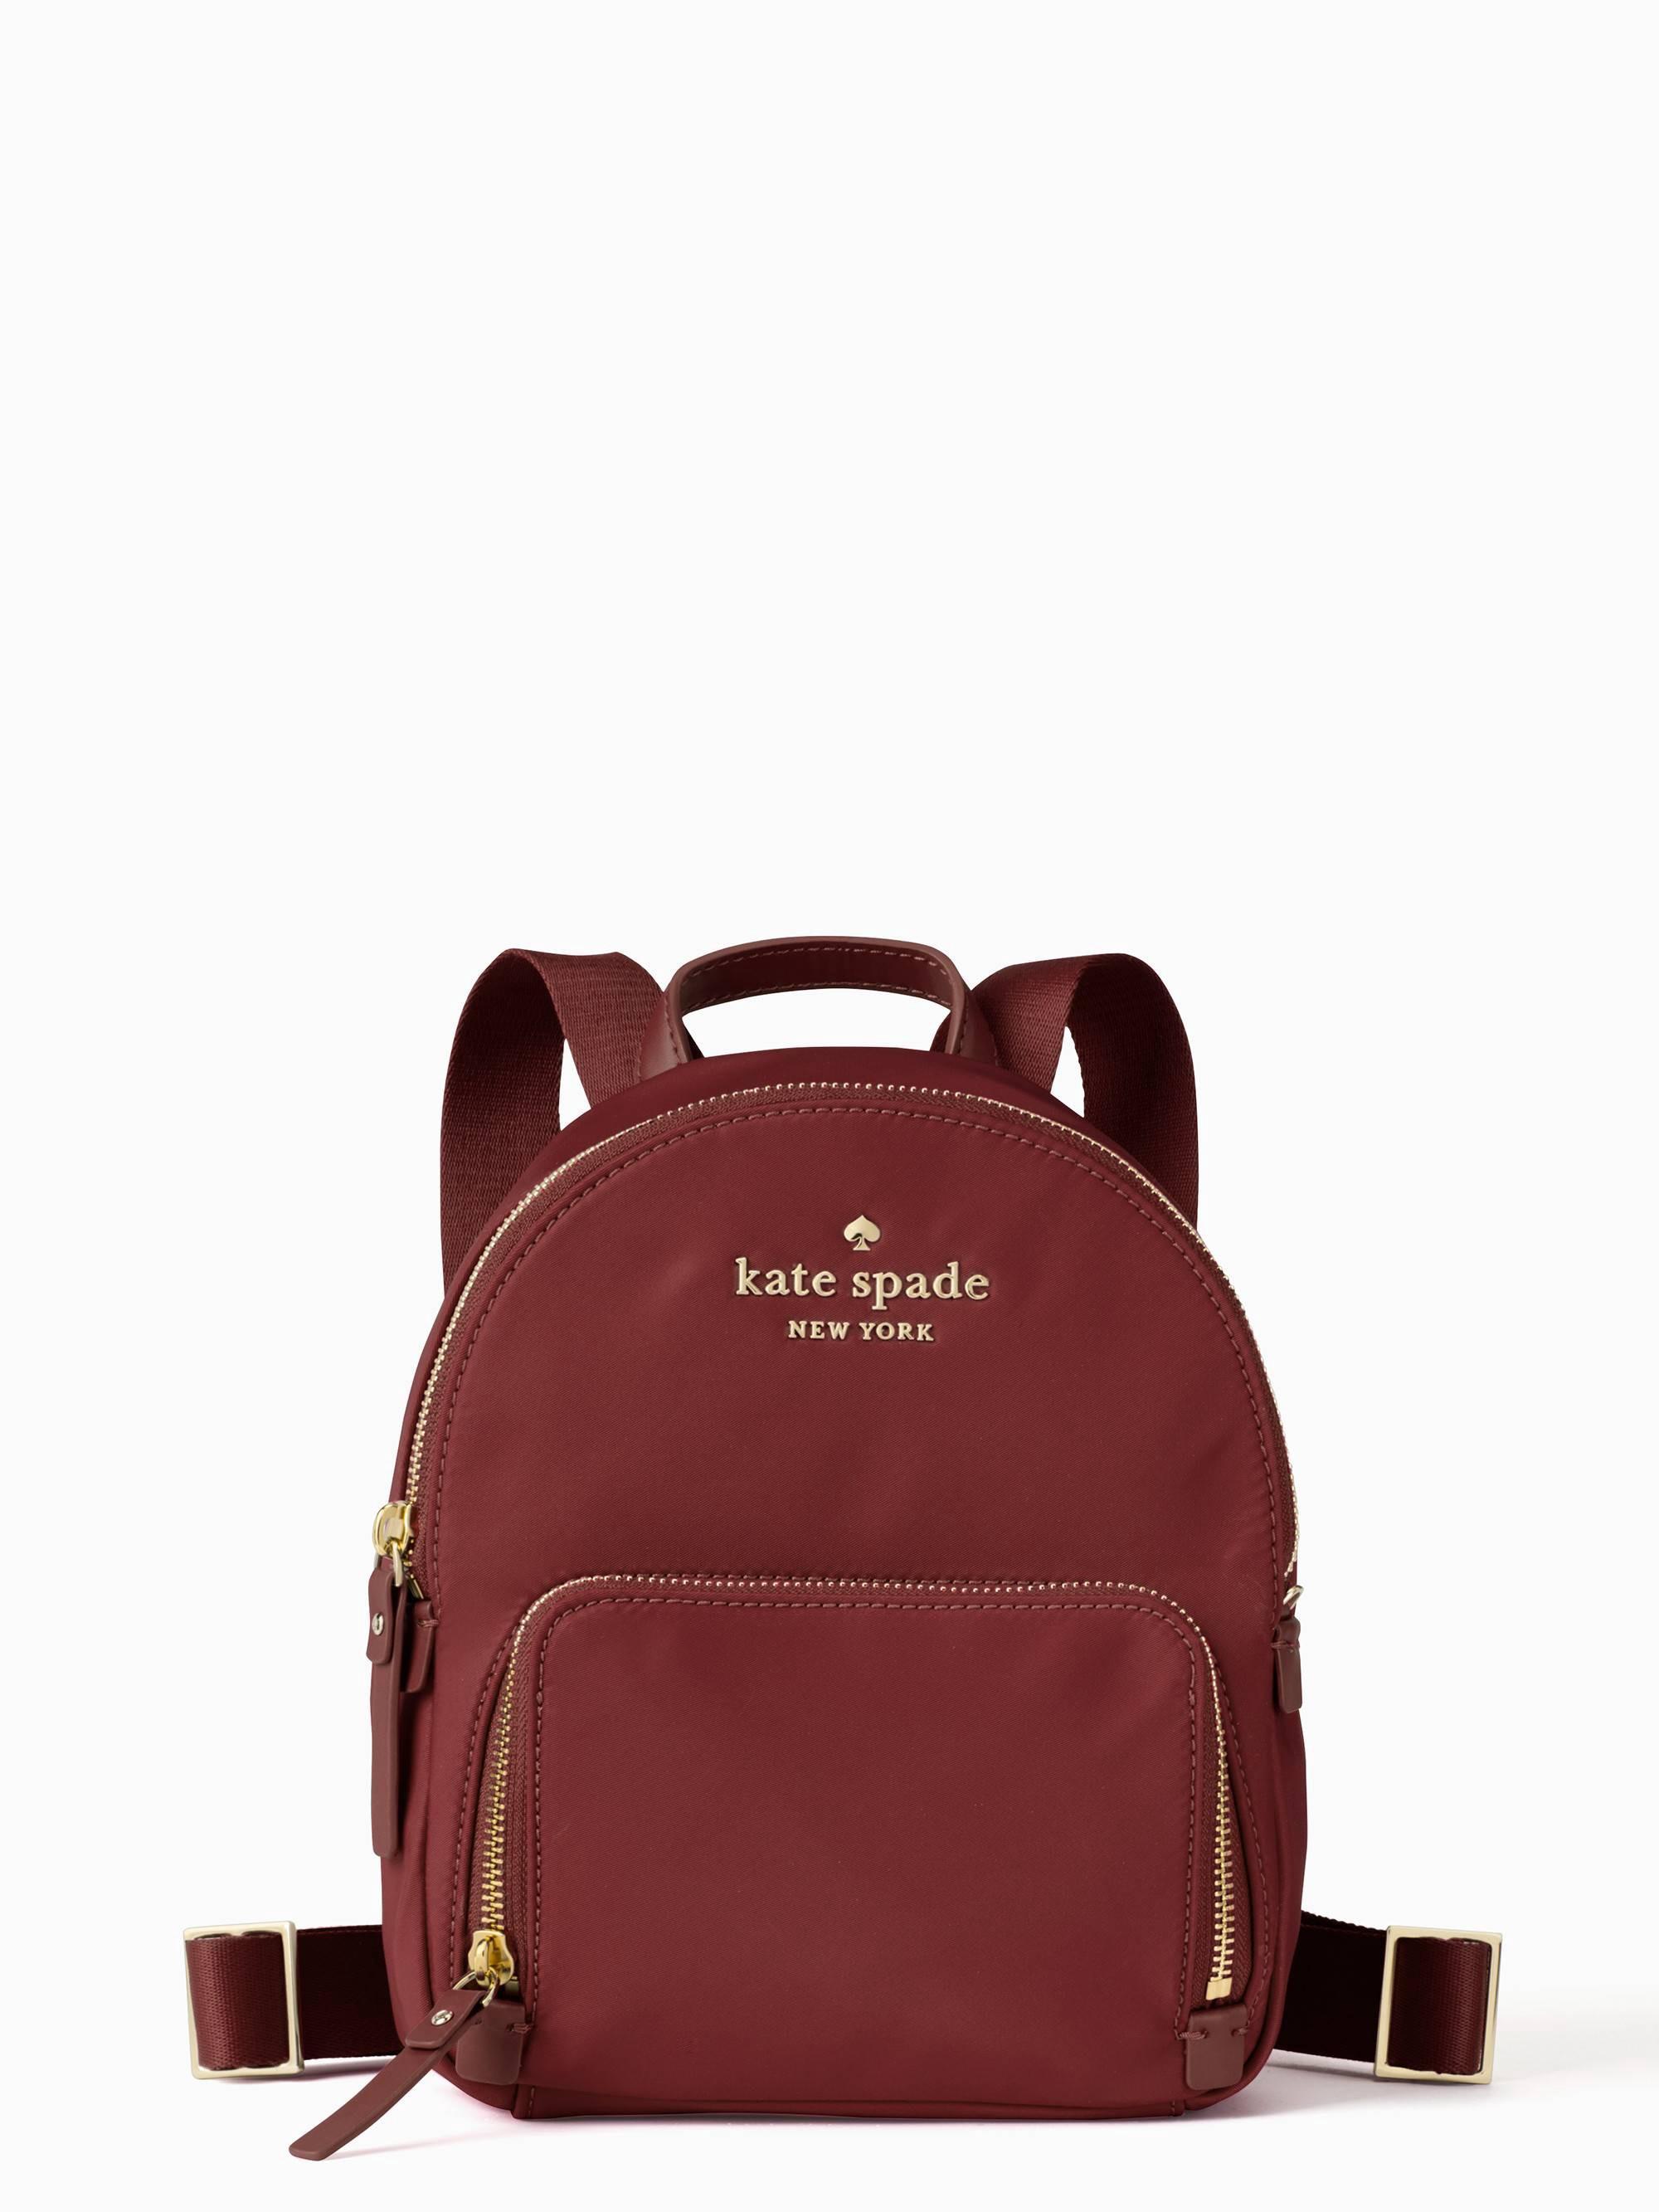 Watson Lane Hartley Nylon Backpack Red In Dark Currant